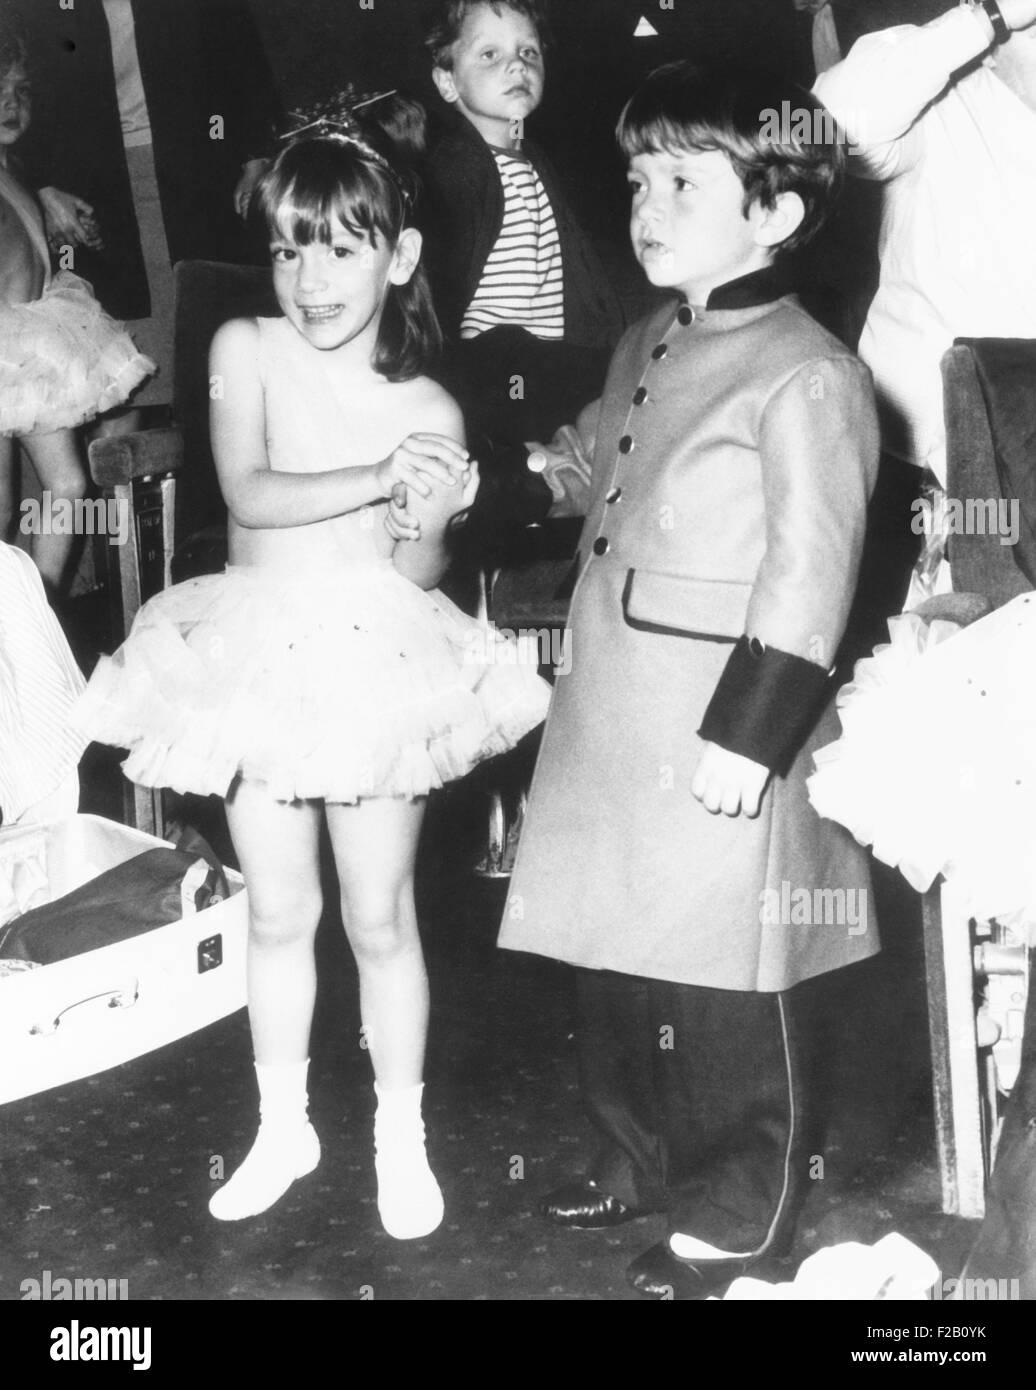 Anthony and Christina Radziwill, the children of Princess Lee Radziwill, at the Shaftesbury Theatre. June 26, 1965. - Stock Image